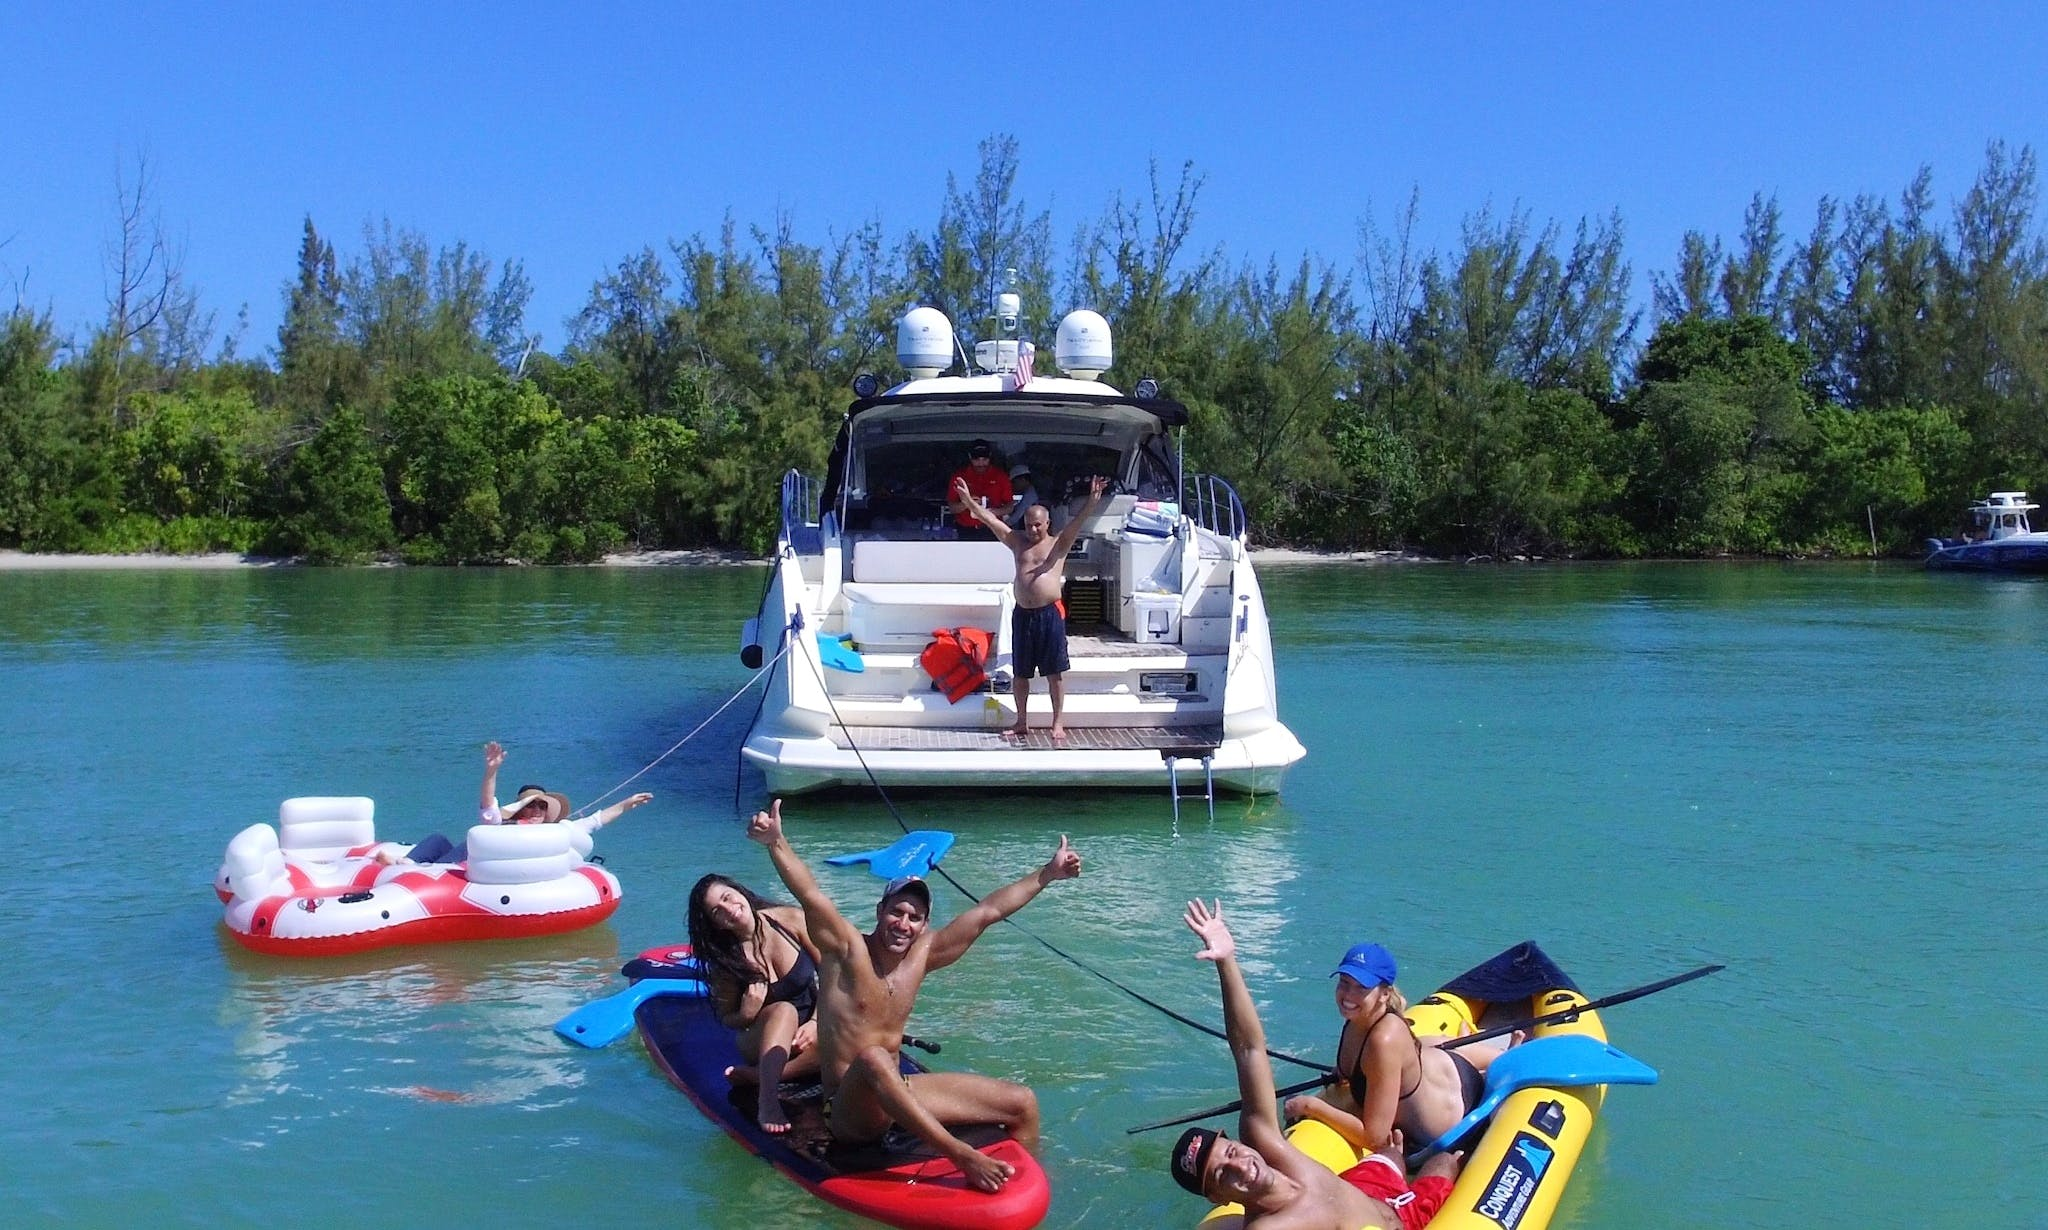 Yacht Rentals Miami - 44' Atlantis - Miami, Florida Keys and The Bahamas!